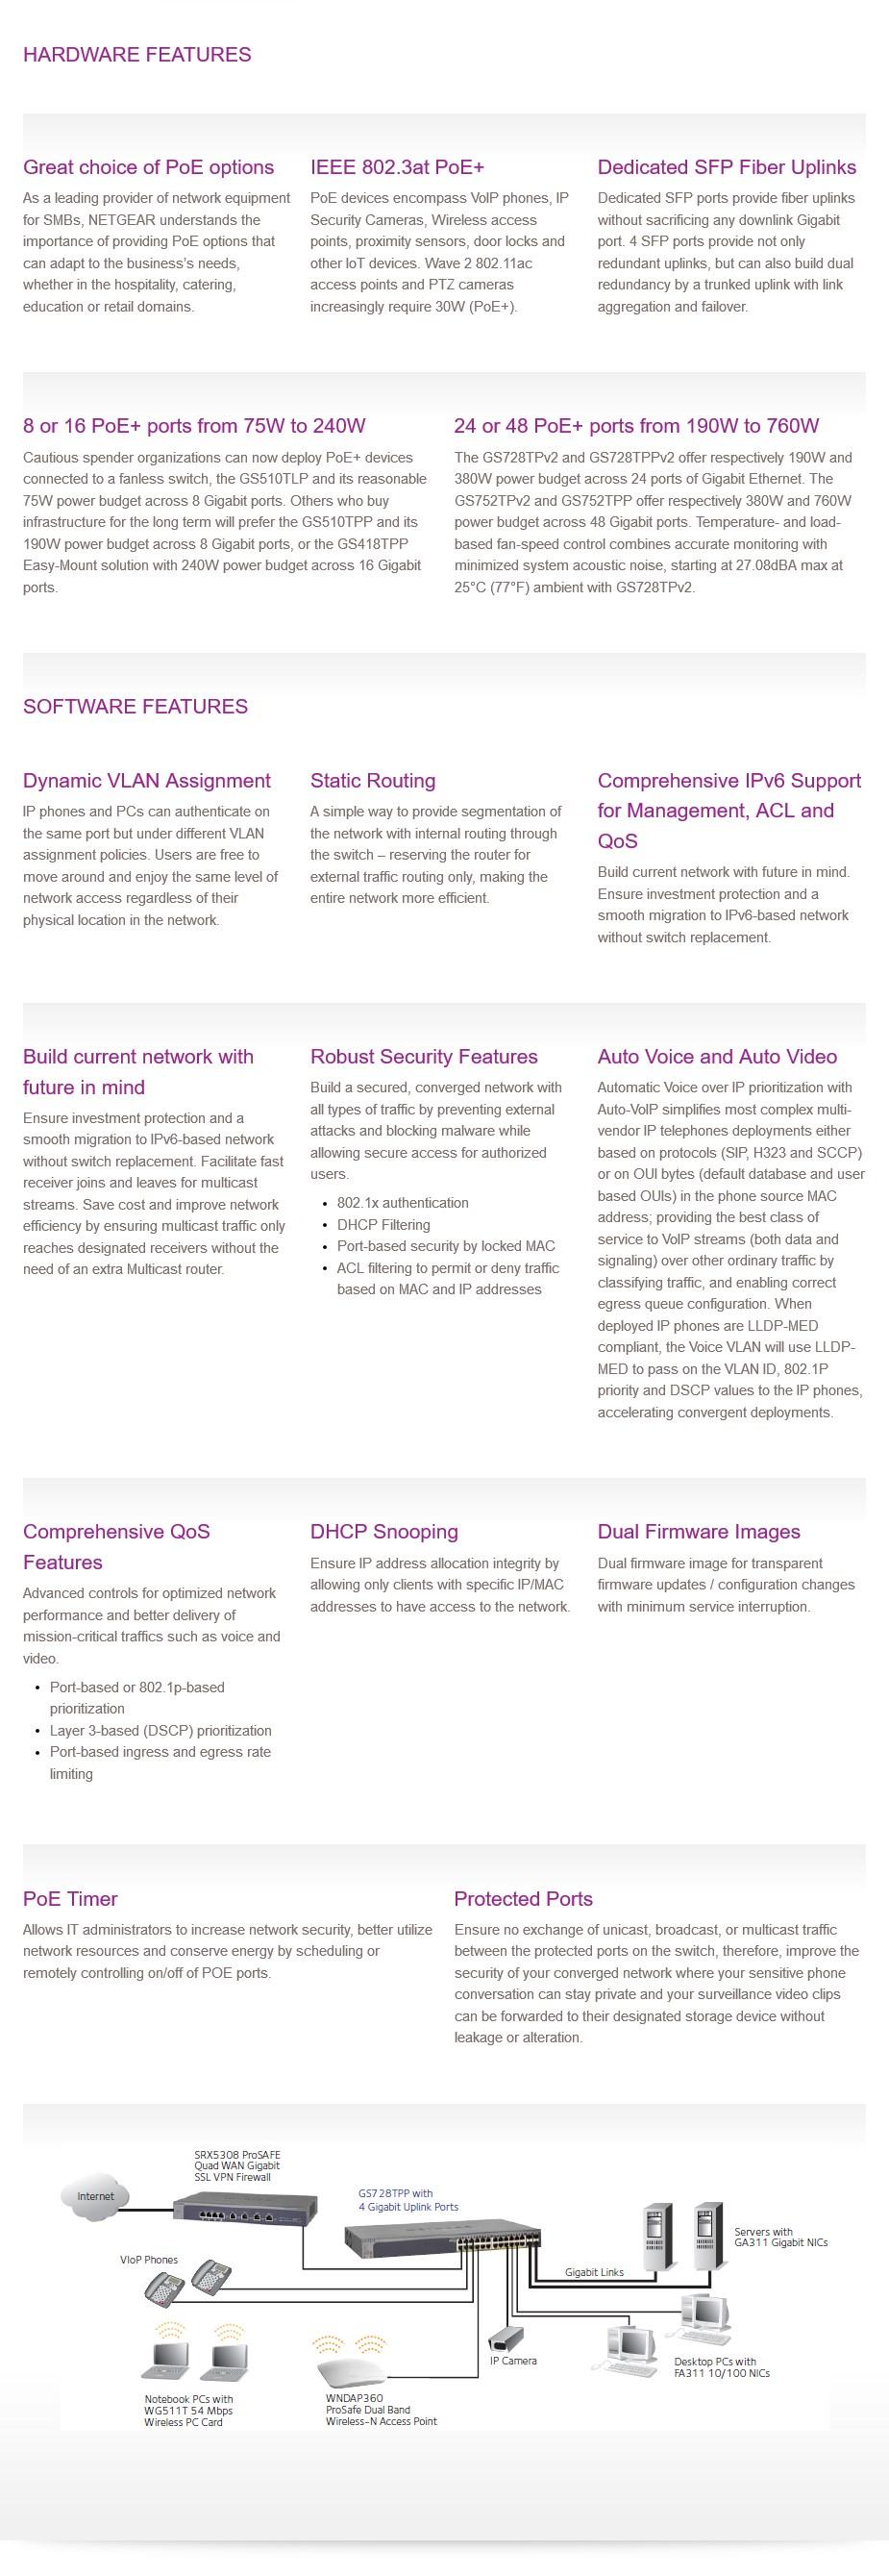 Netgear GS752TP 48-Port Gigabit PoE+ Smart Managed Pro Switch with 4 SFP Ports - Desktop Overview 2